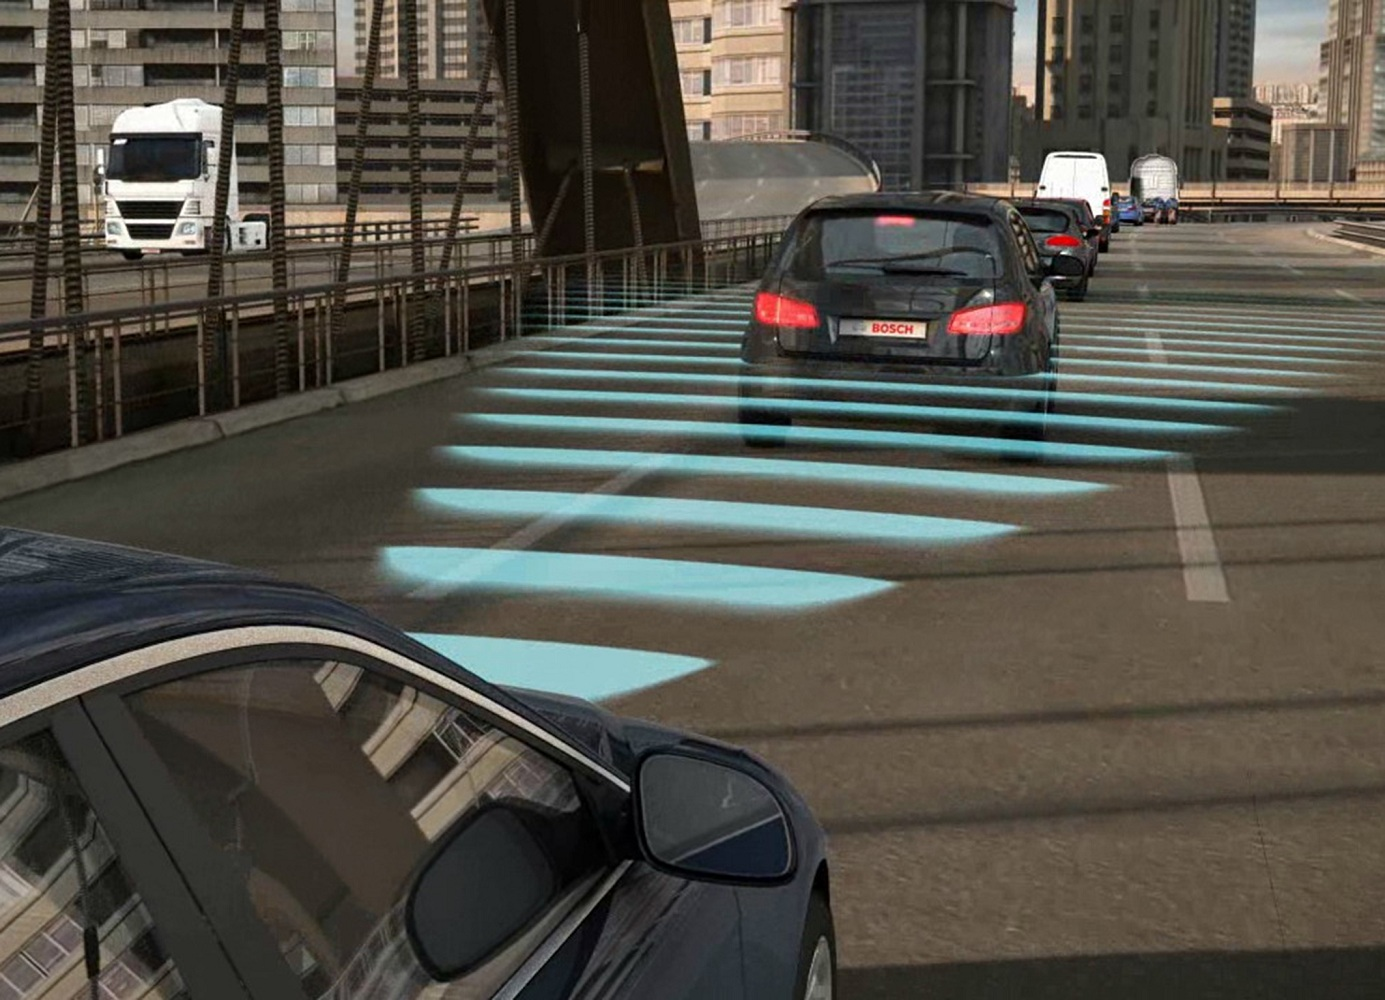 Bosch adaptive cruise control